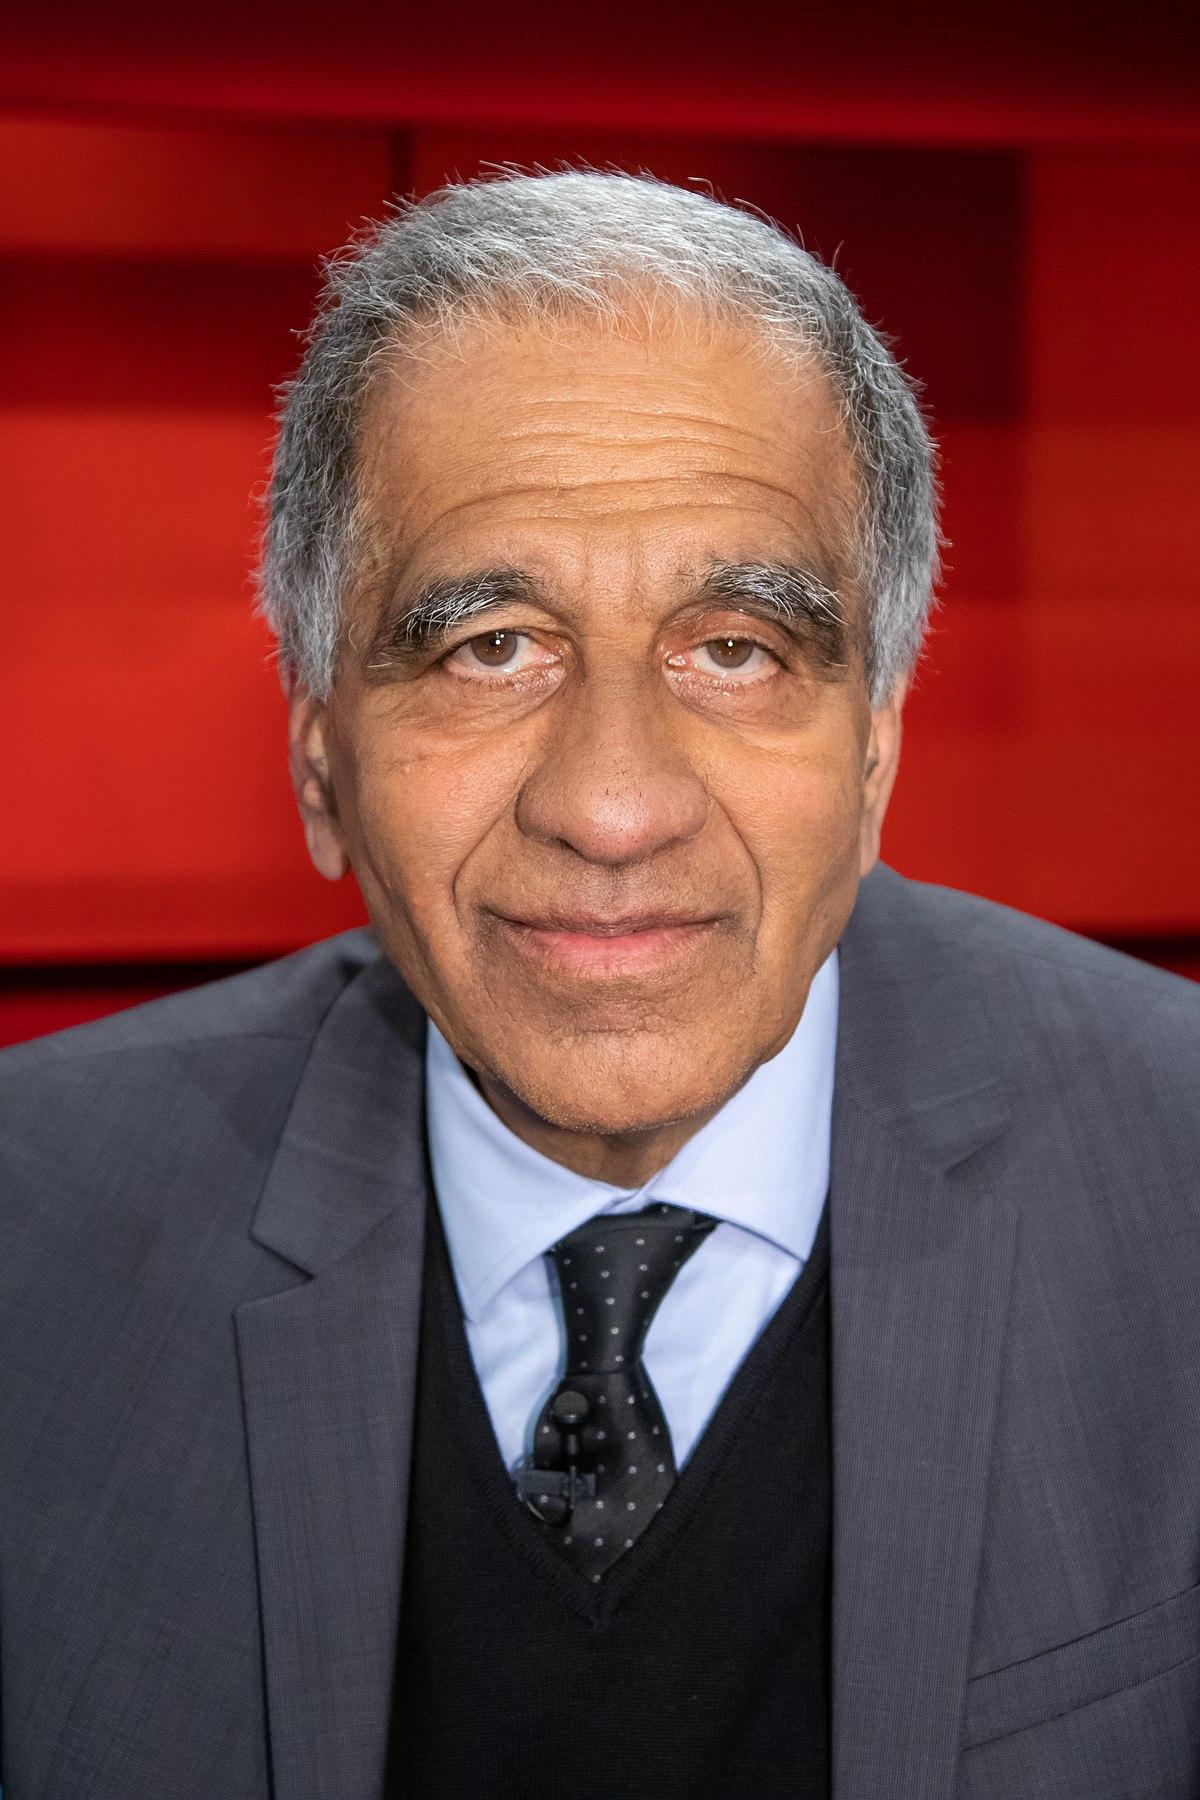 Latif Mojib